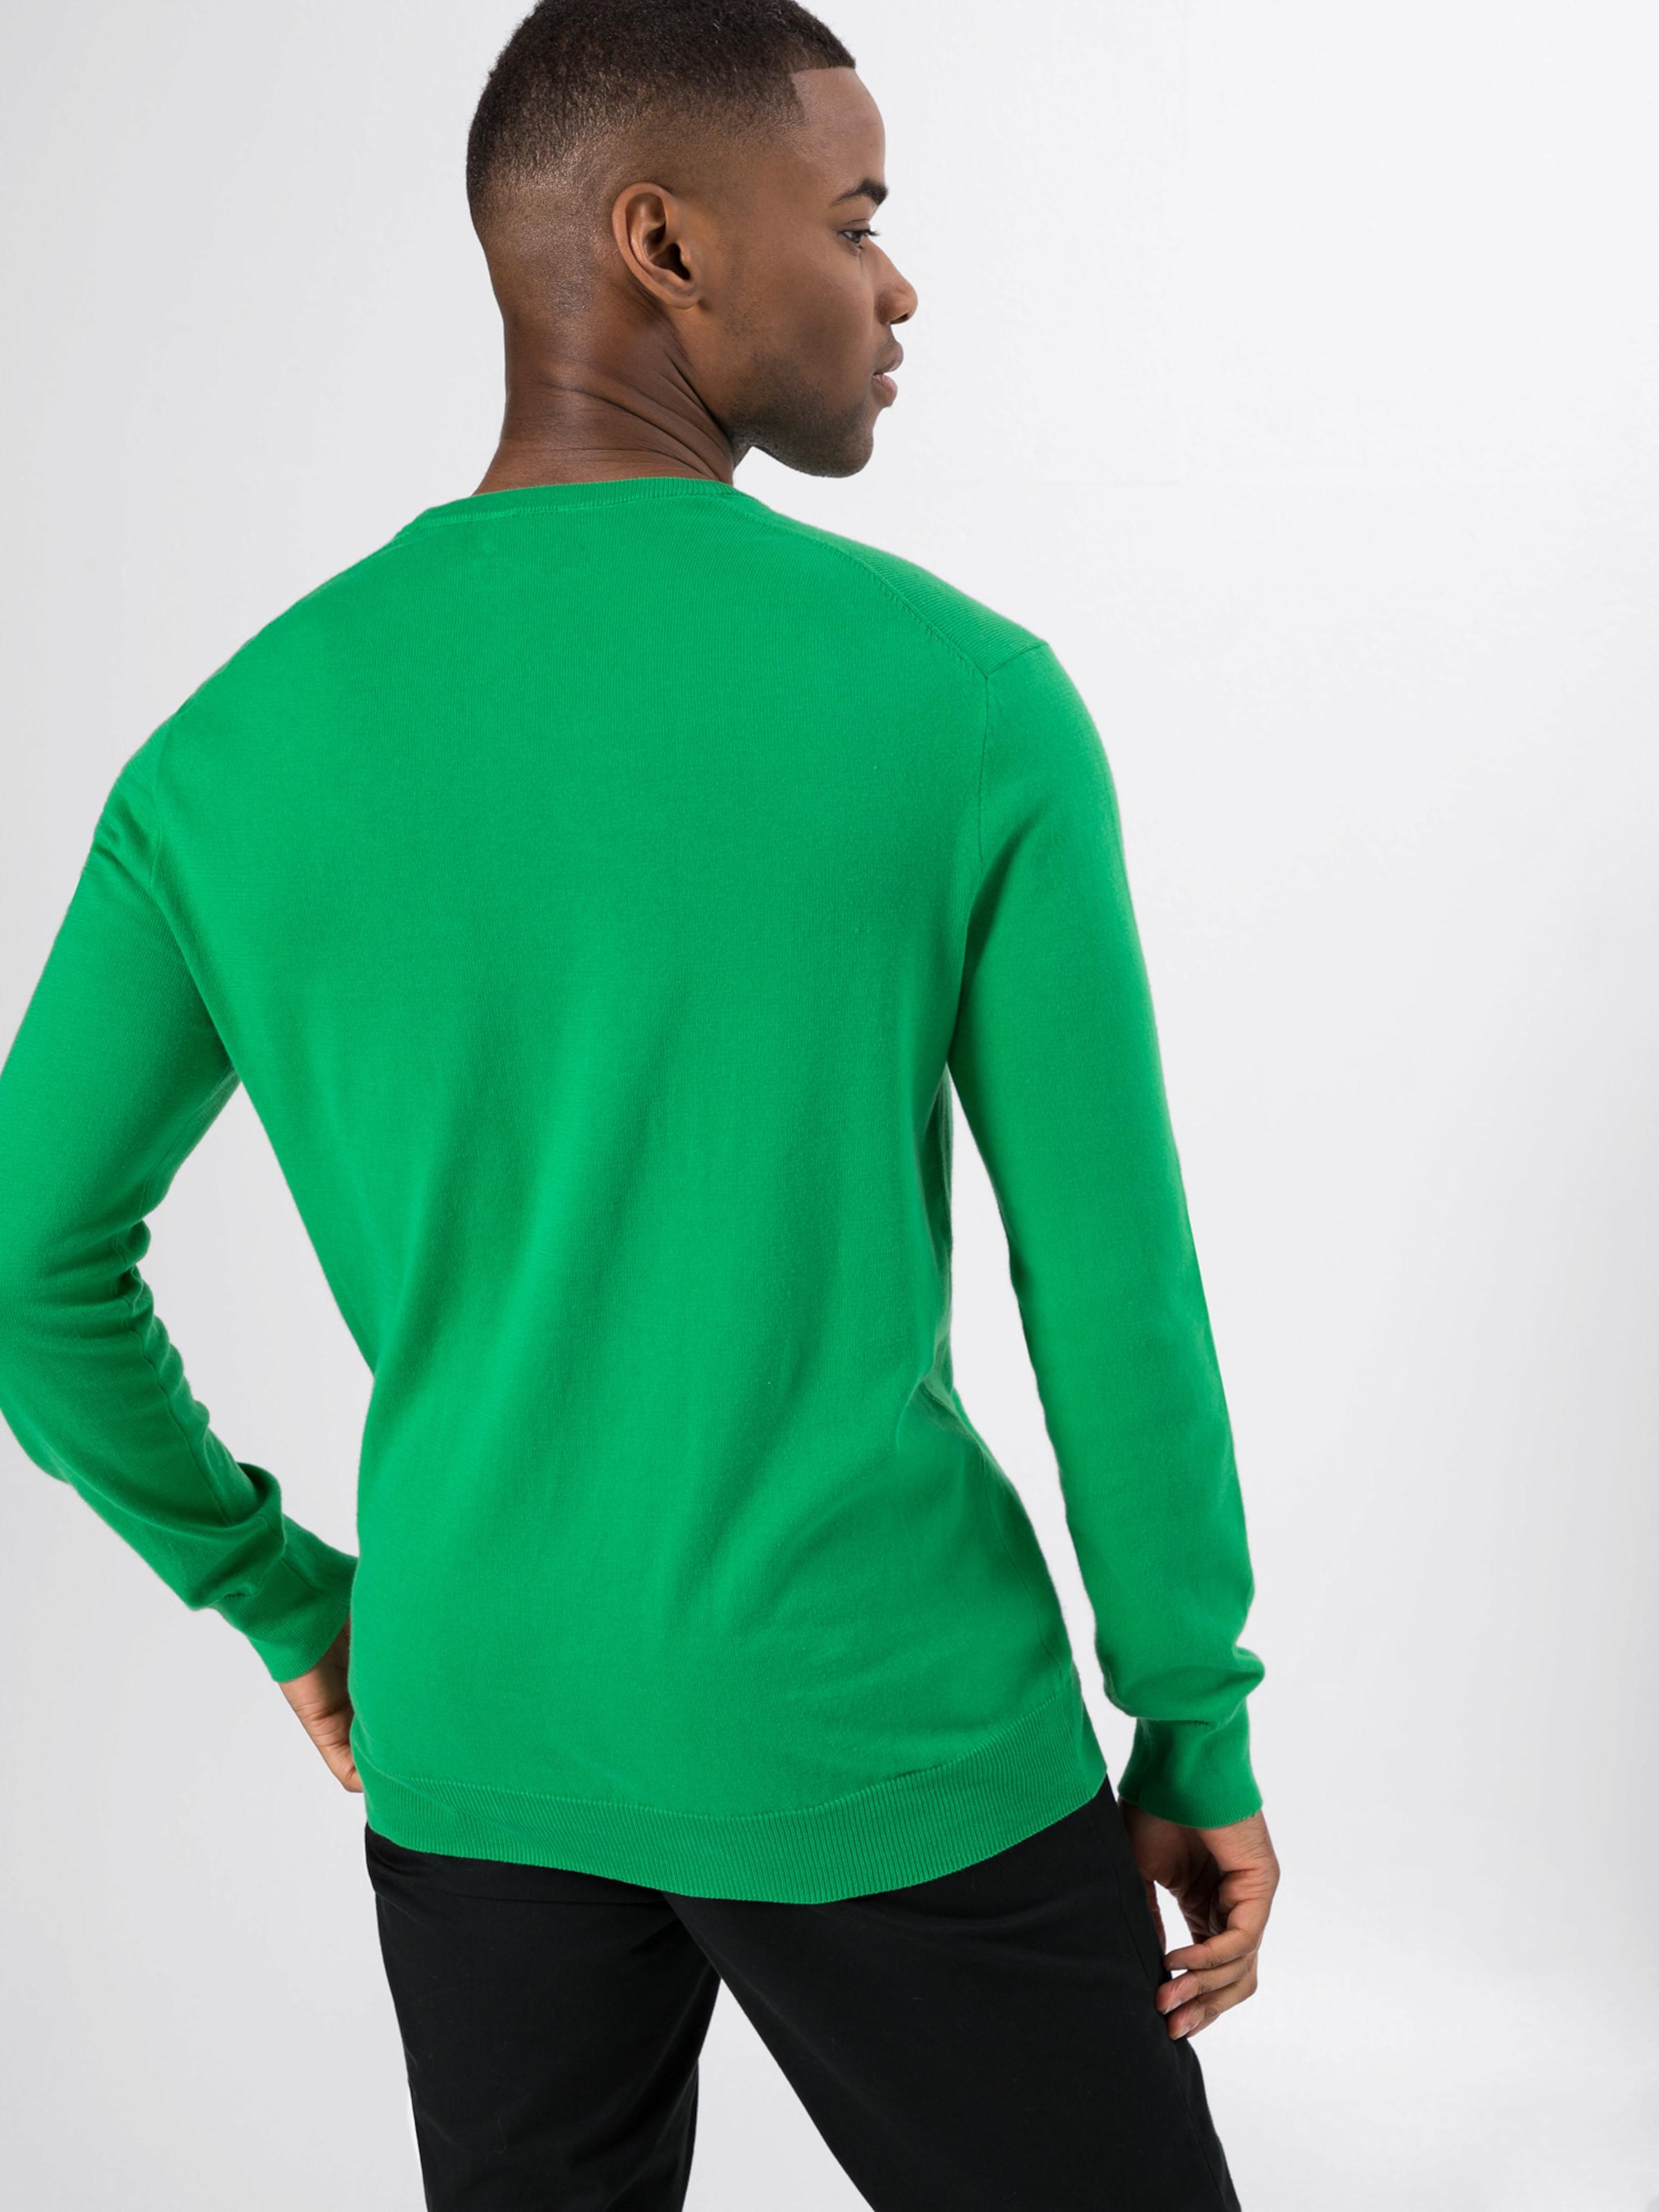 sweater' 'ls Polo Sleeve long Vert over Sf Cn Pp Foncé Ralph En Lauren Pull cFJK1lT